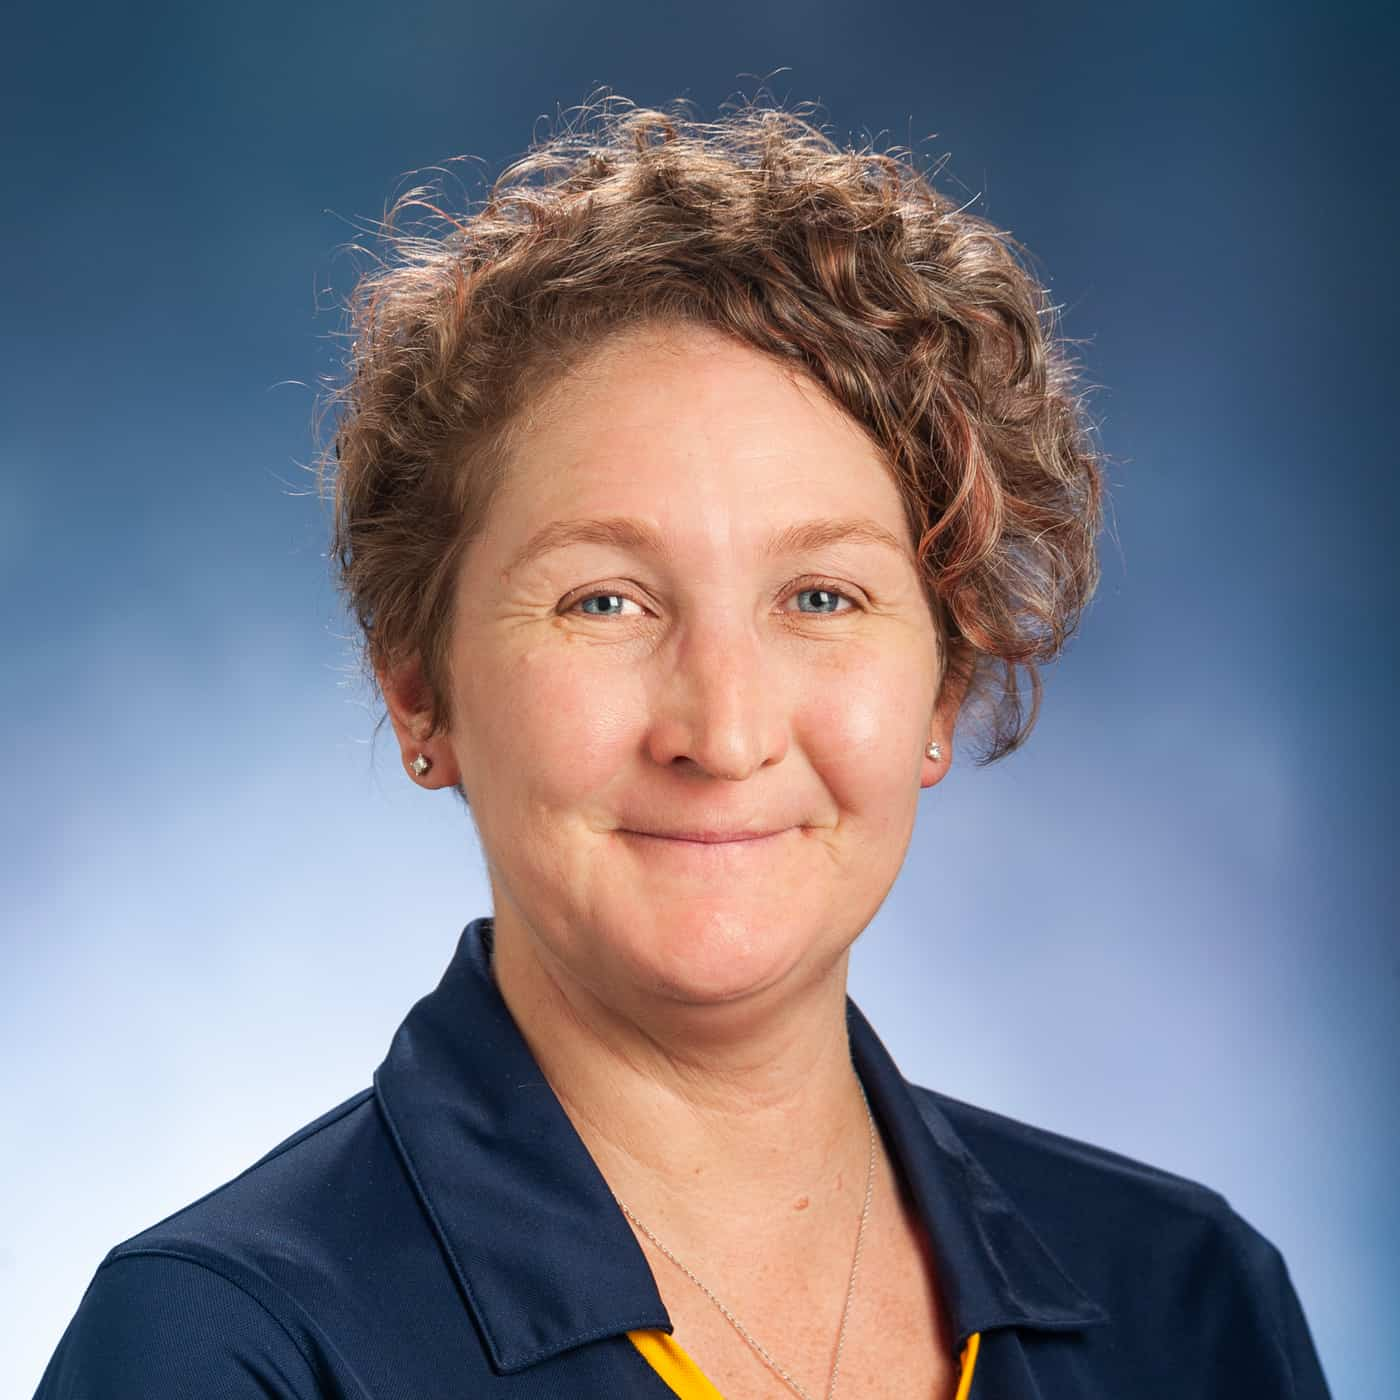 Dr. Melanie Fields, A&M-Commerce